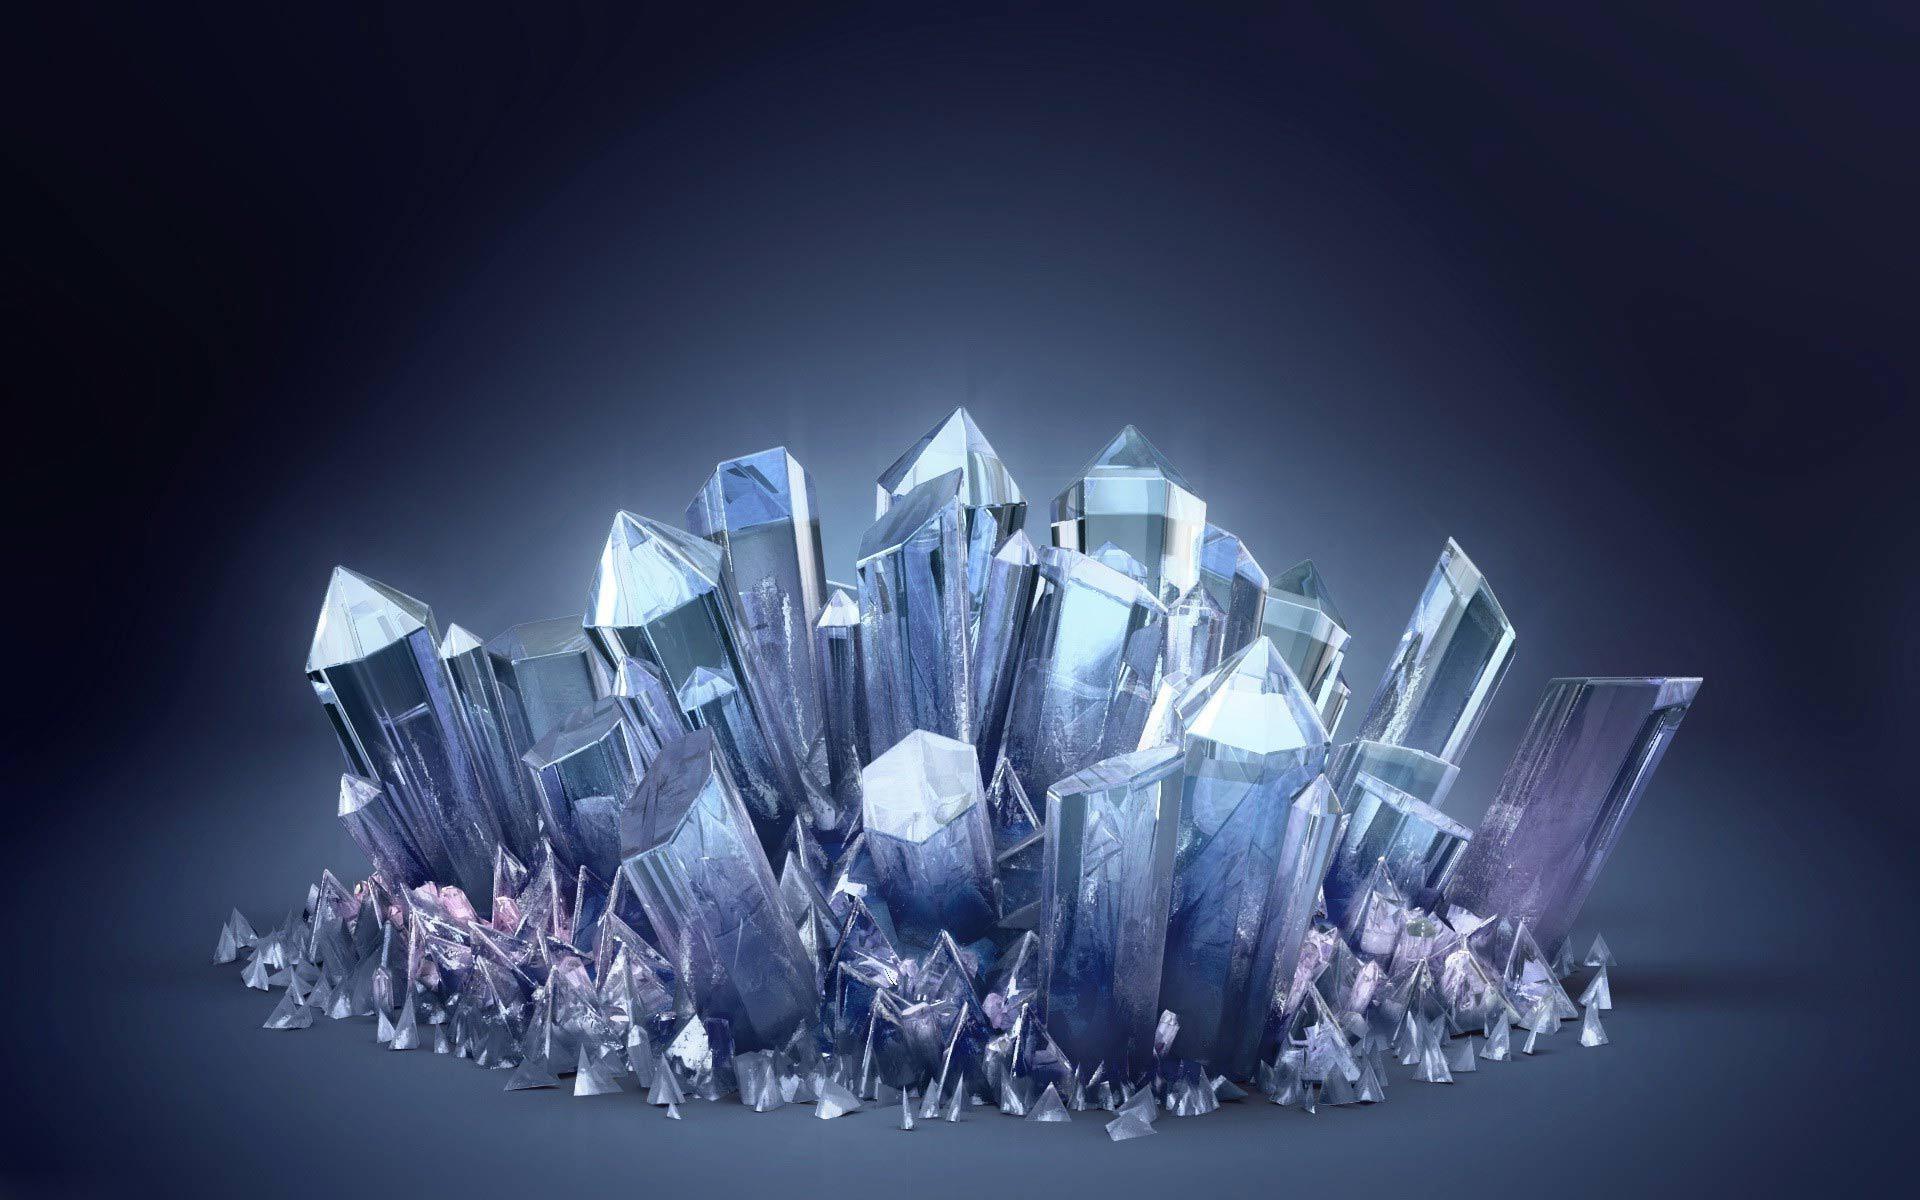 Crystal Wallpaper 29296 1920x1200 px